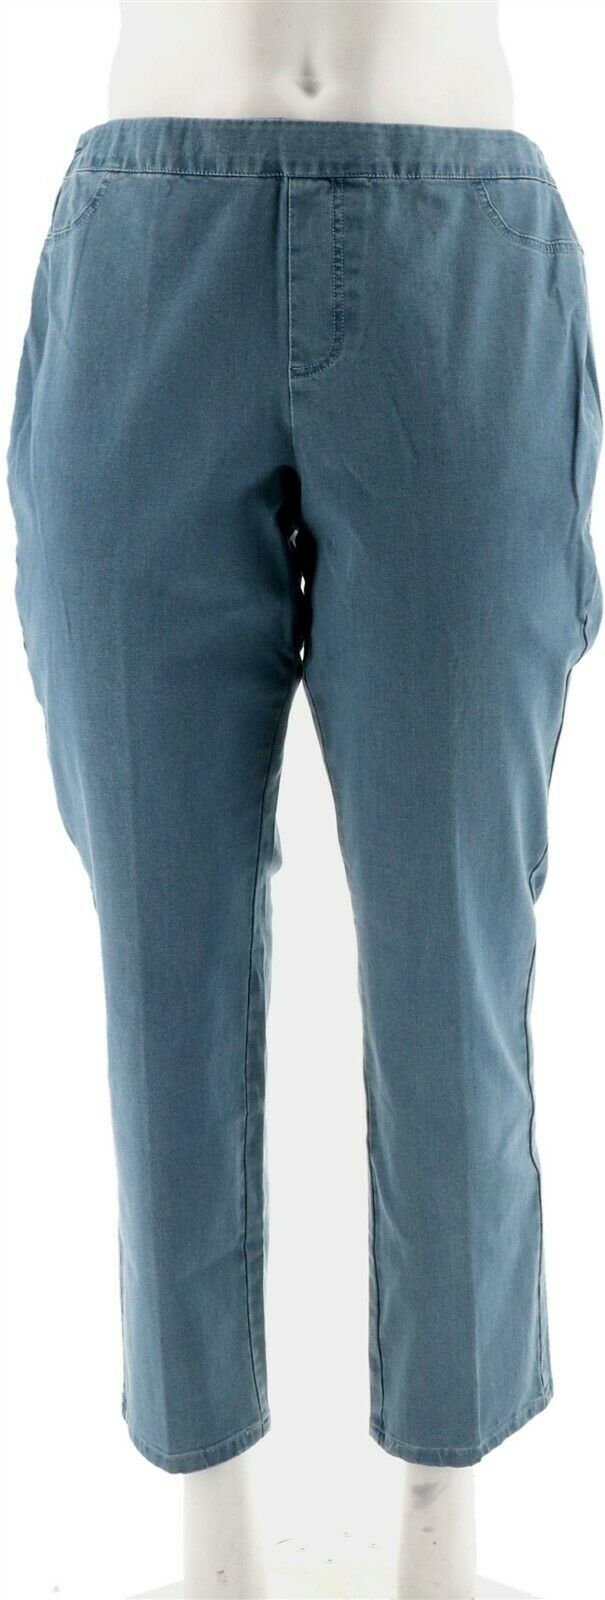 24//7 Denim Straight Leg Jeans Size 20 Plus Petite Isaac Mizrahi Live